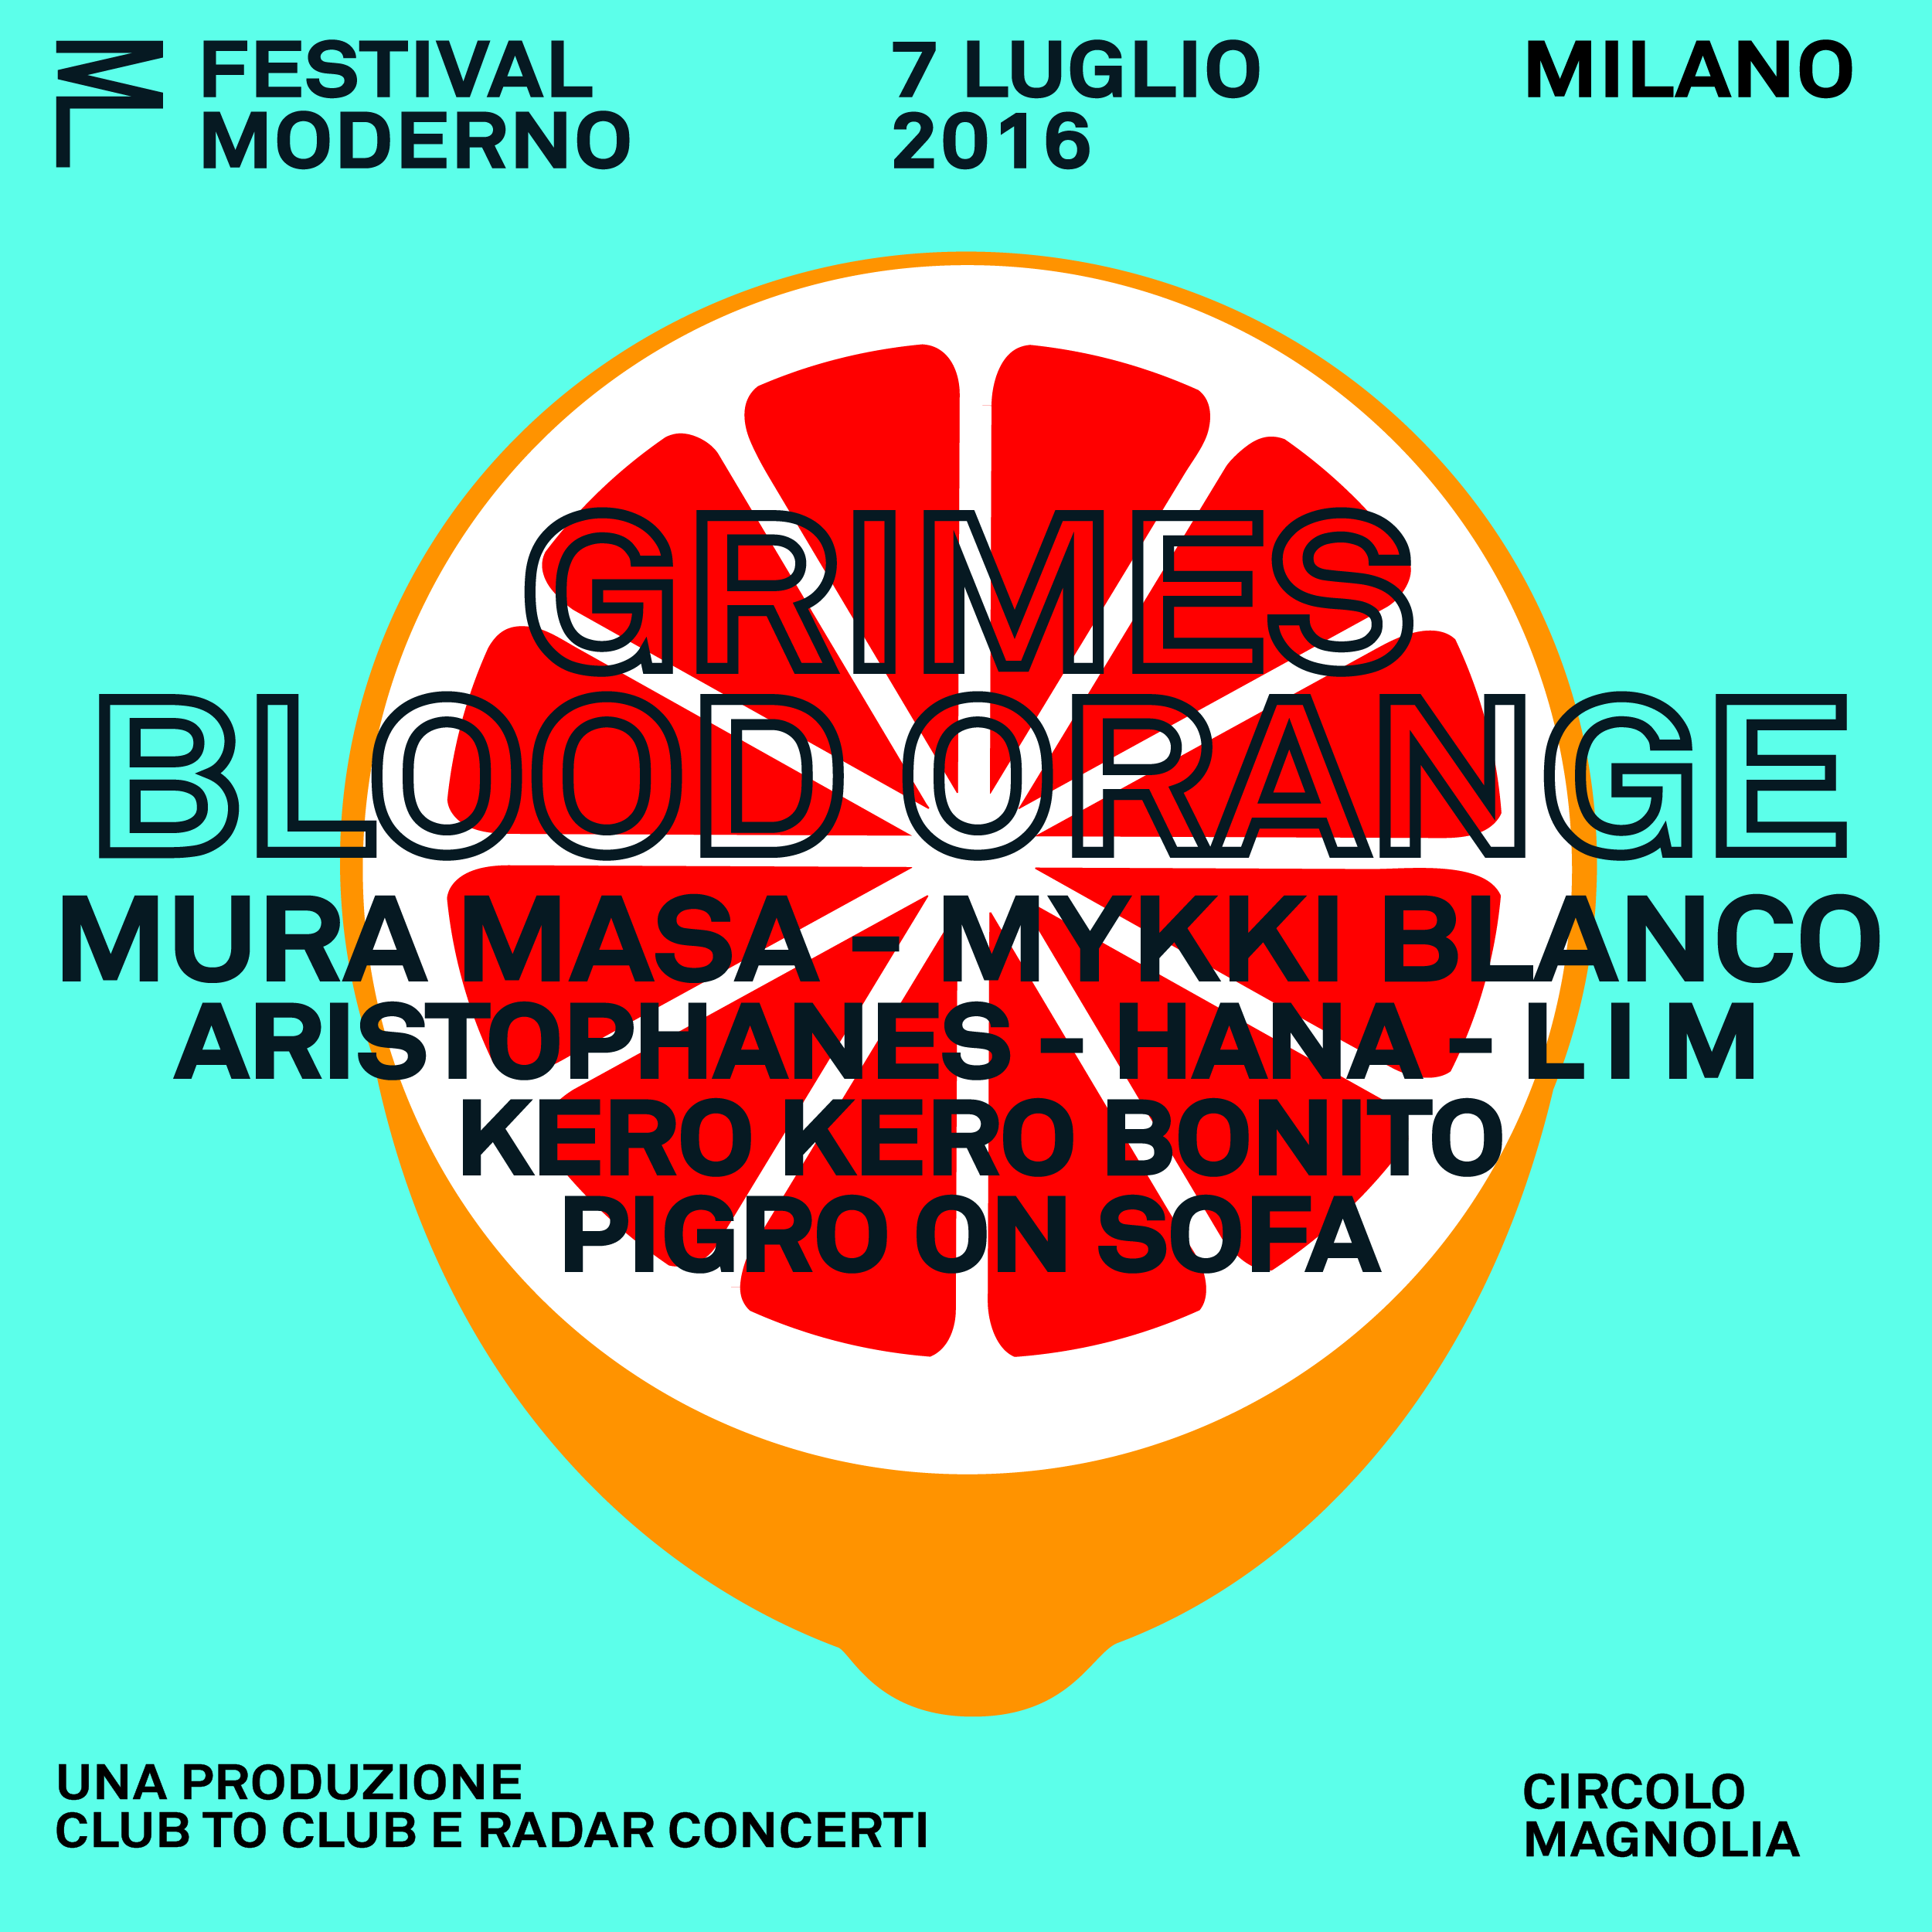 Festival Moderno